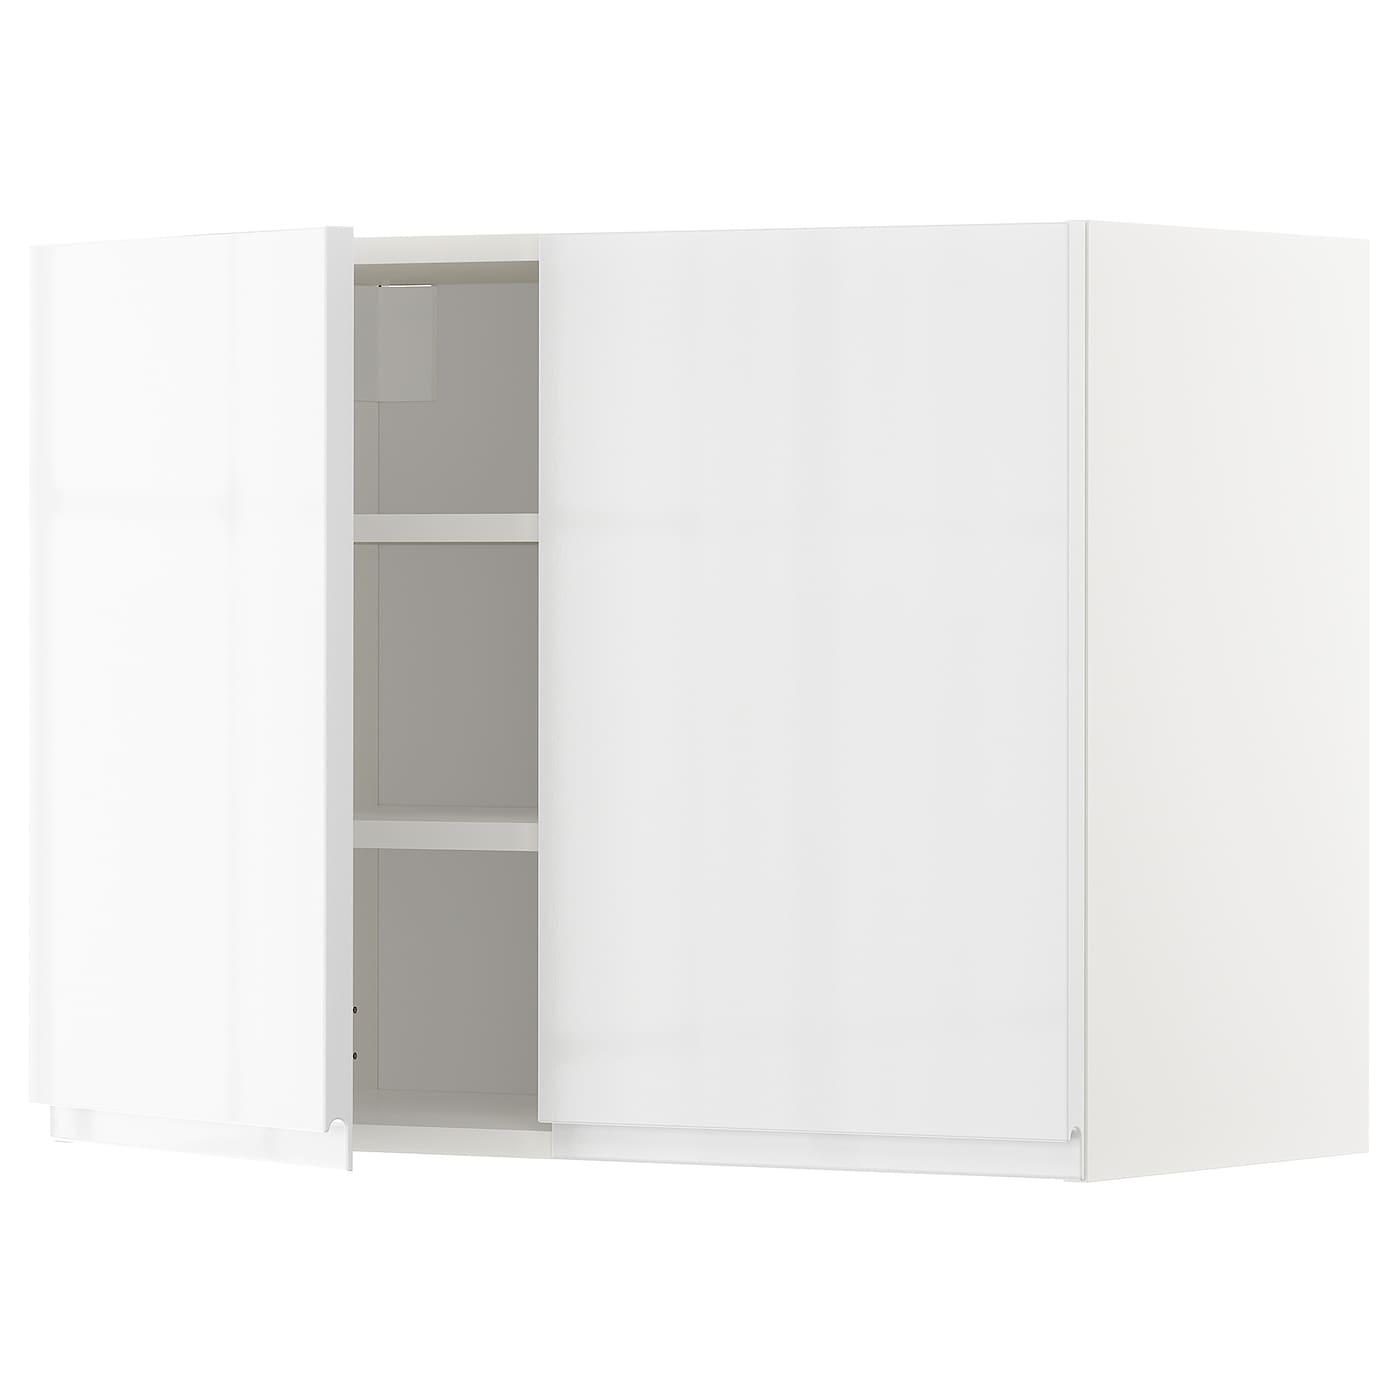 Metod armario de pared cocina con baldas blanco voxtorp alto brillo blanco 80 x 60 cm ikea - Ikea armarios de cocina ...